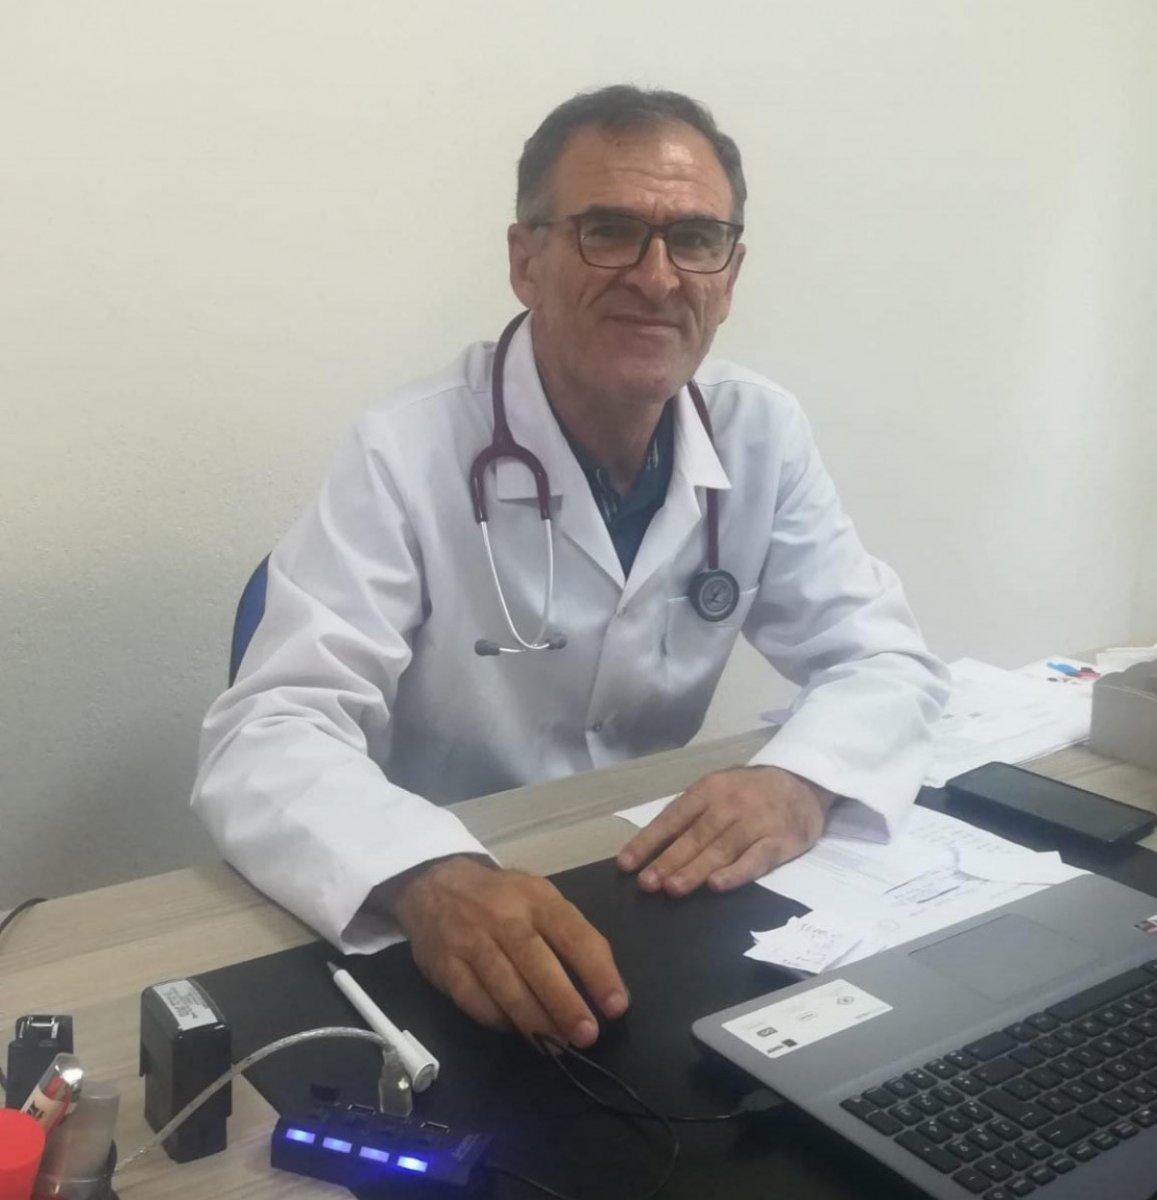 Manisa'da doktora yumruklu saldırı #2